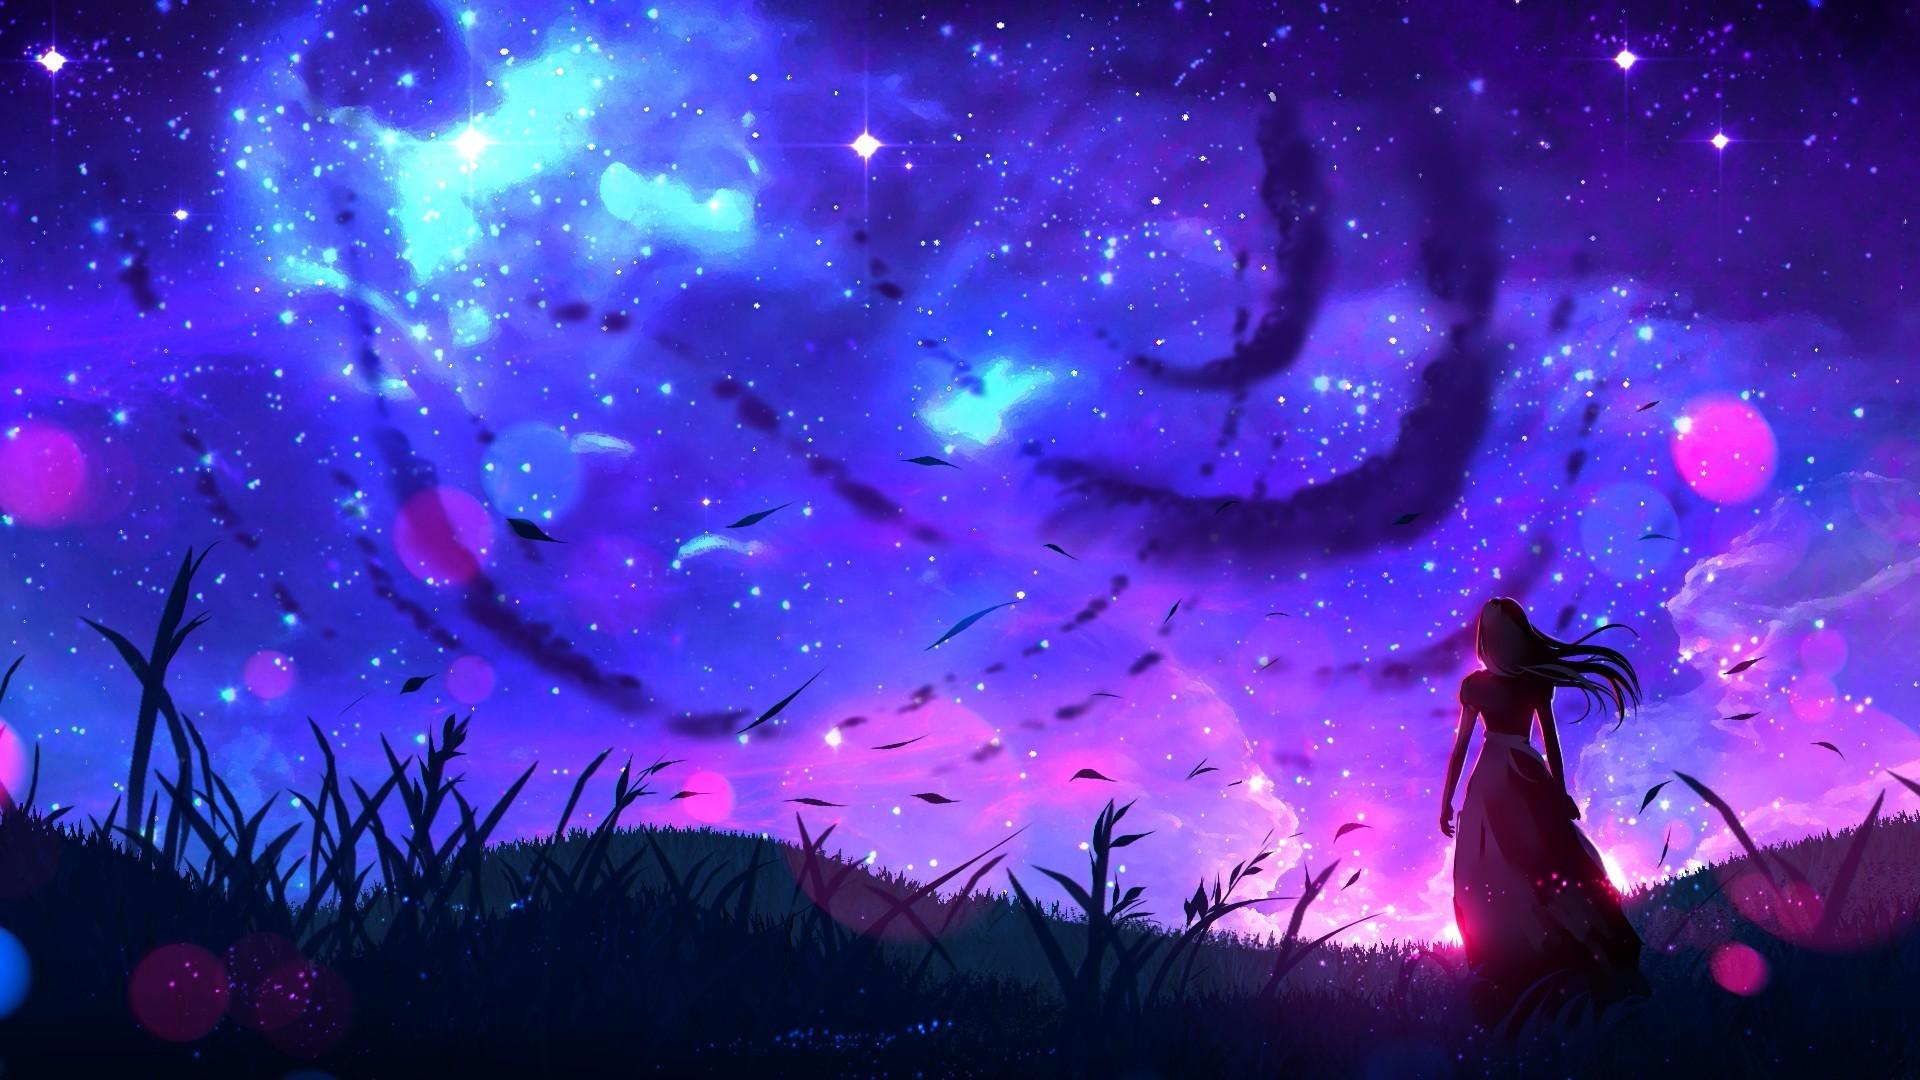 art-landscape-night-anime-girl-original Ideas For Anime Art Landscape @koolgadgetz.com.info